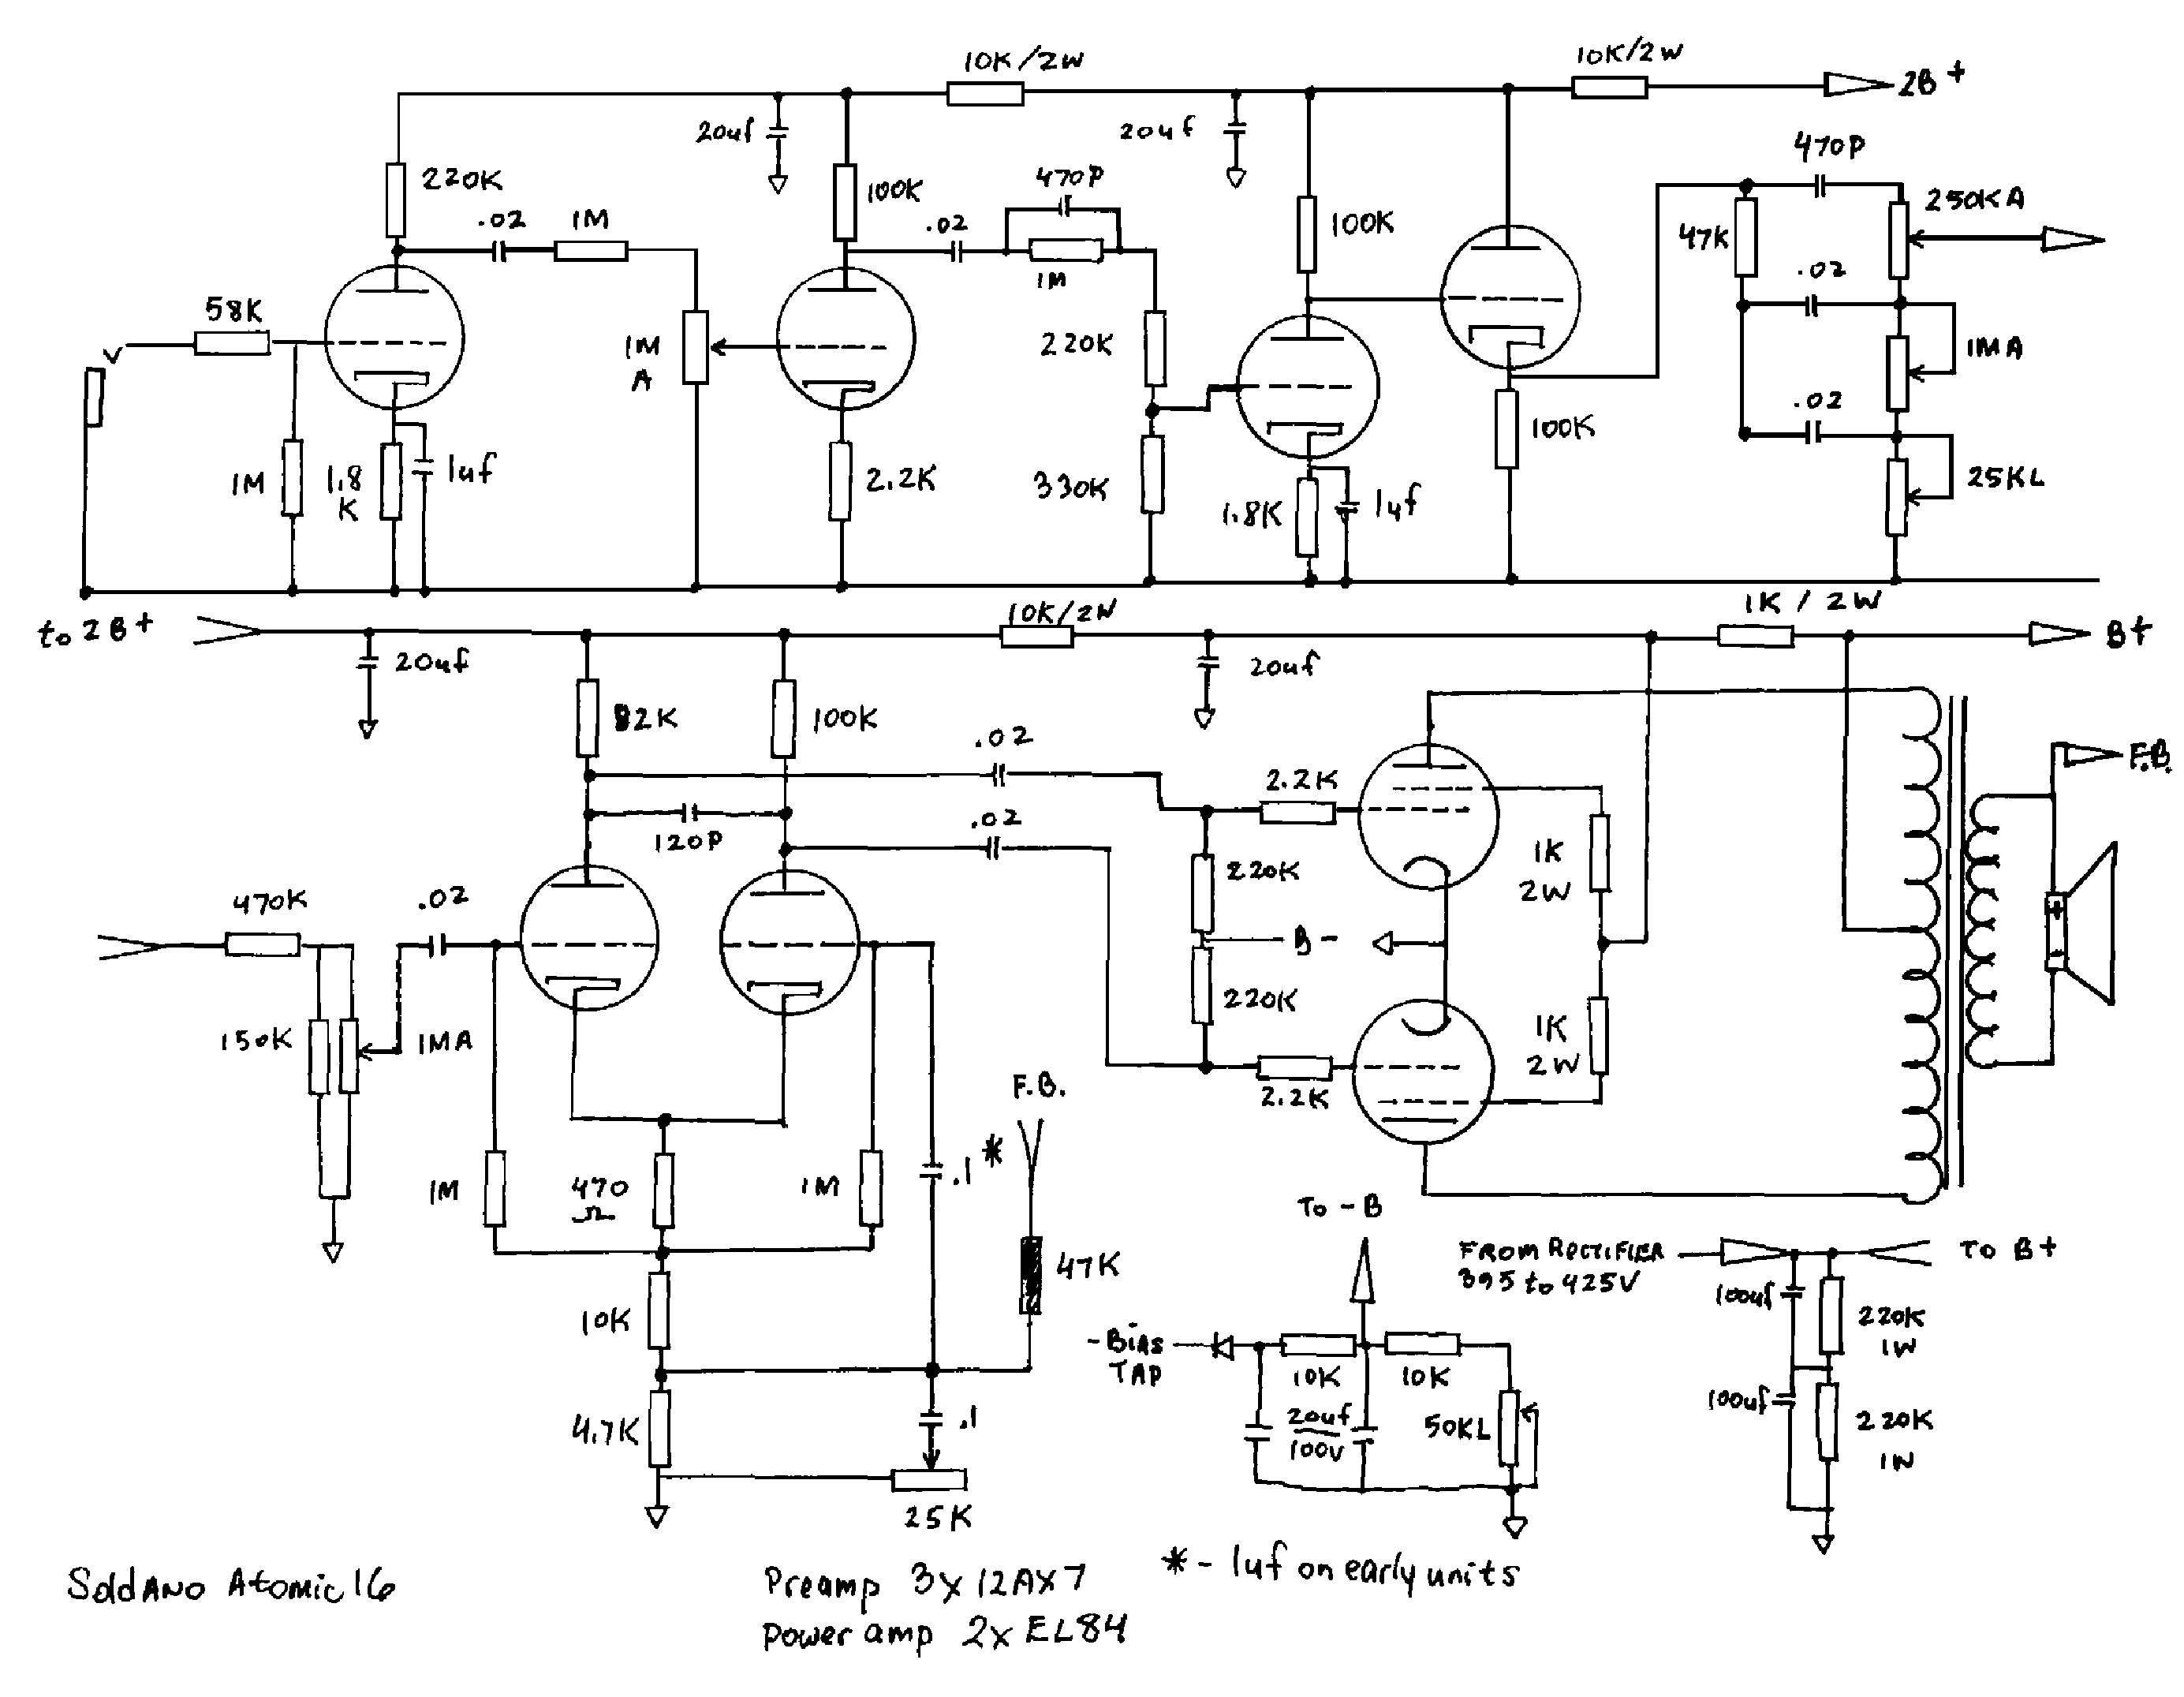 soldano atomic 16 service manual download  schematics